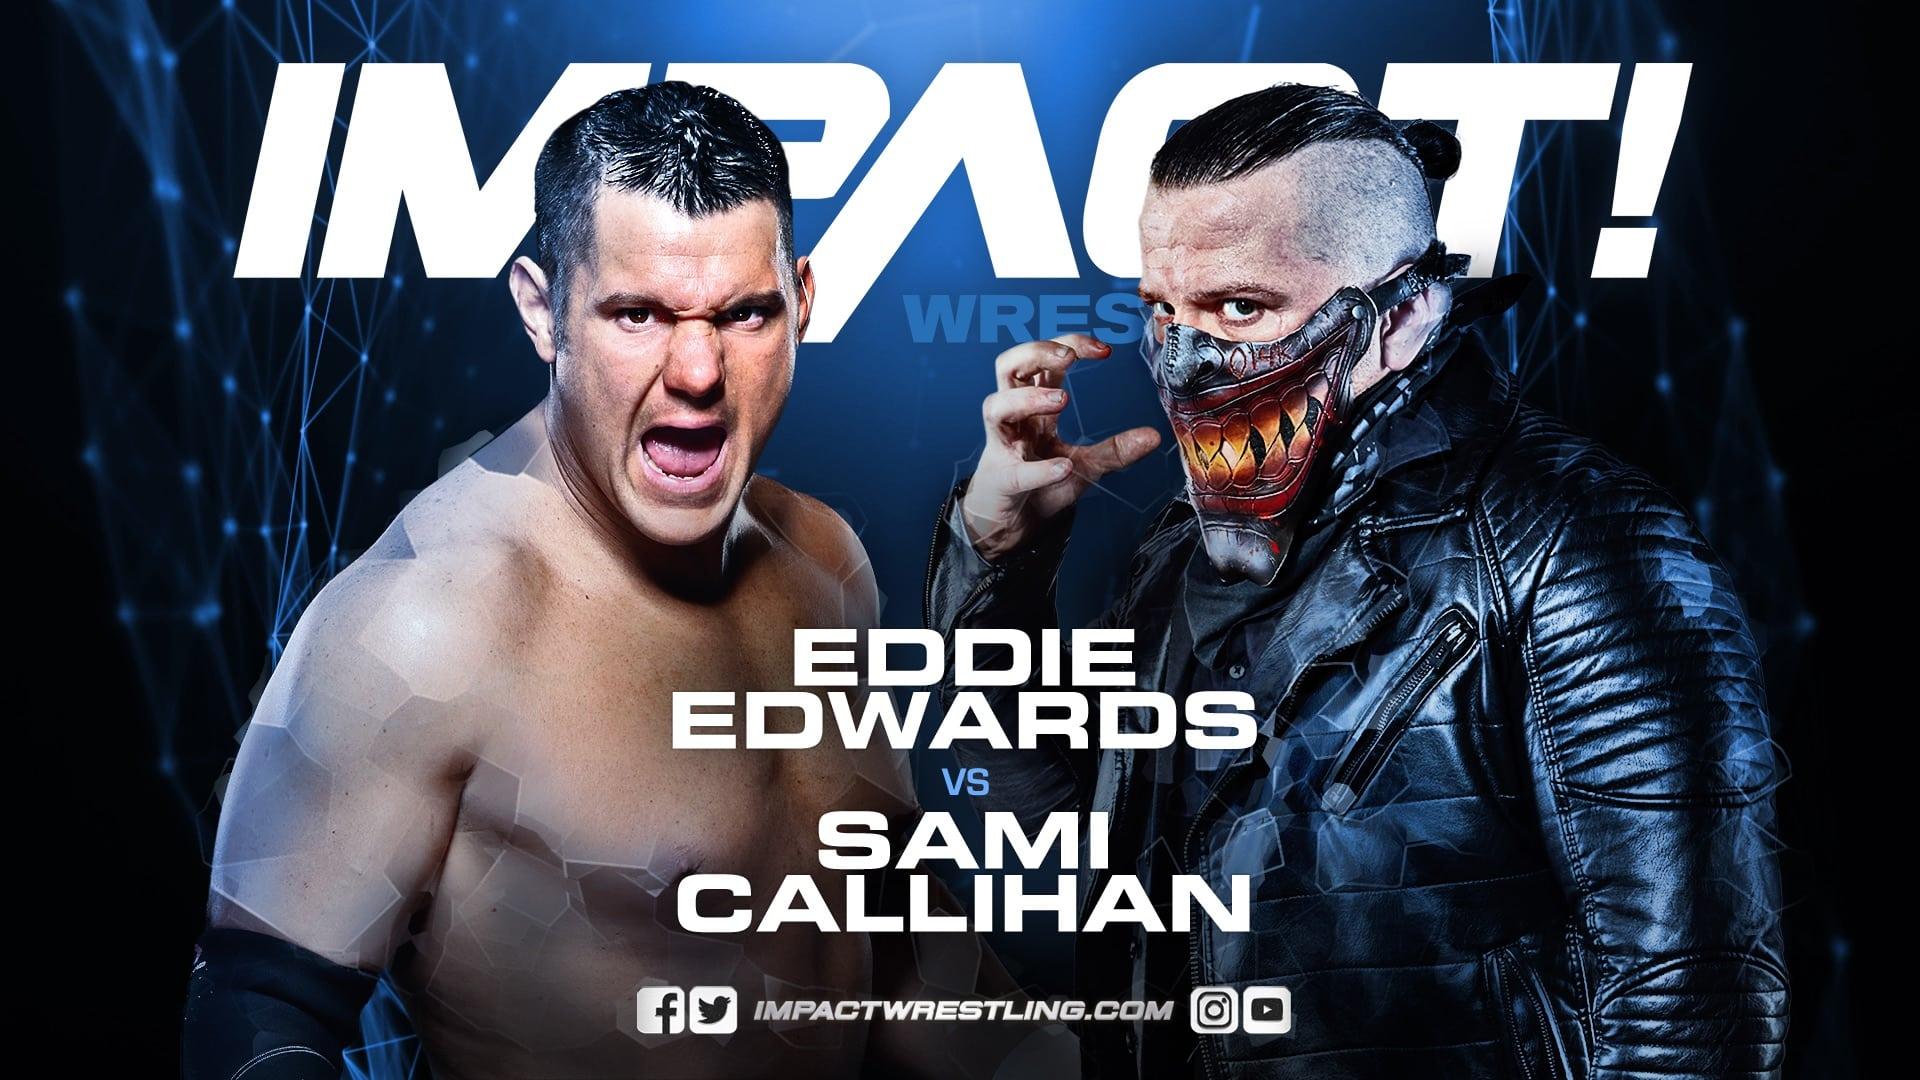 Resultados Impact Wrestling (7-jun-2018) — Edwards vs Callihan sin ganador 1